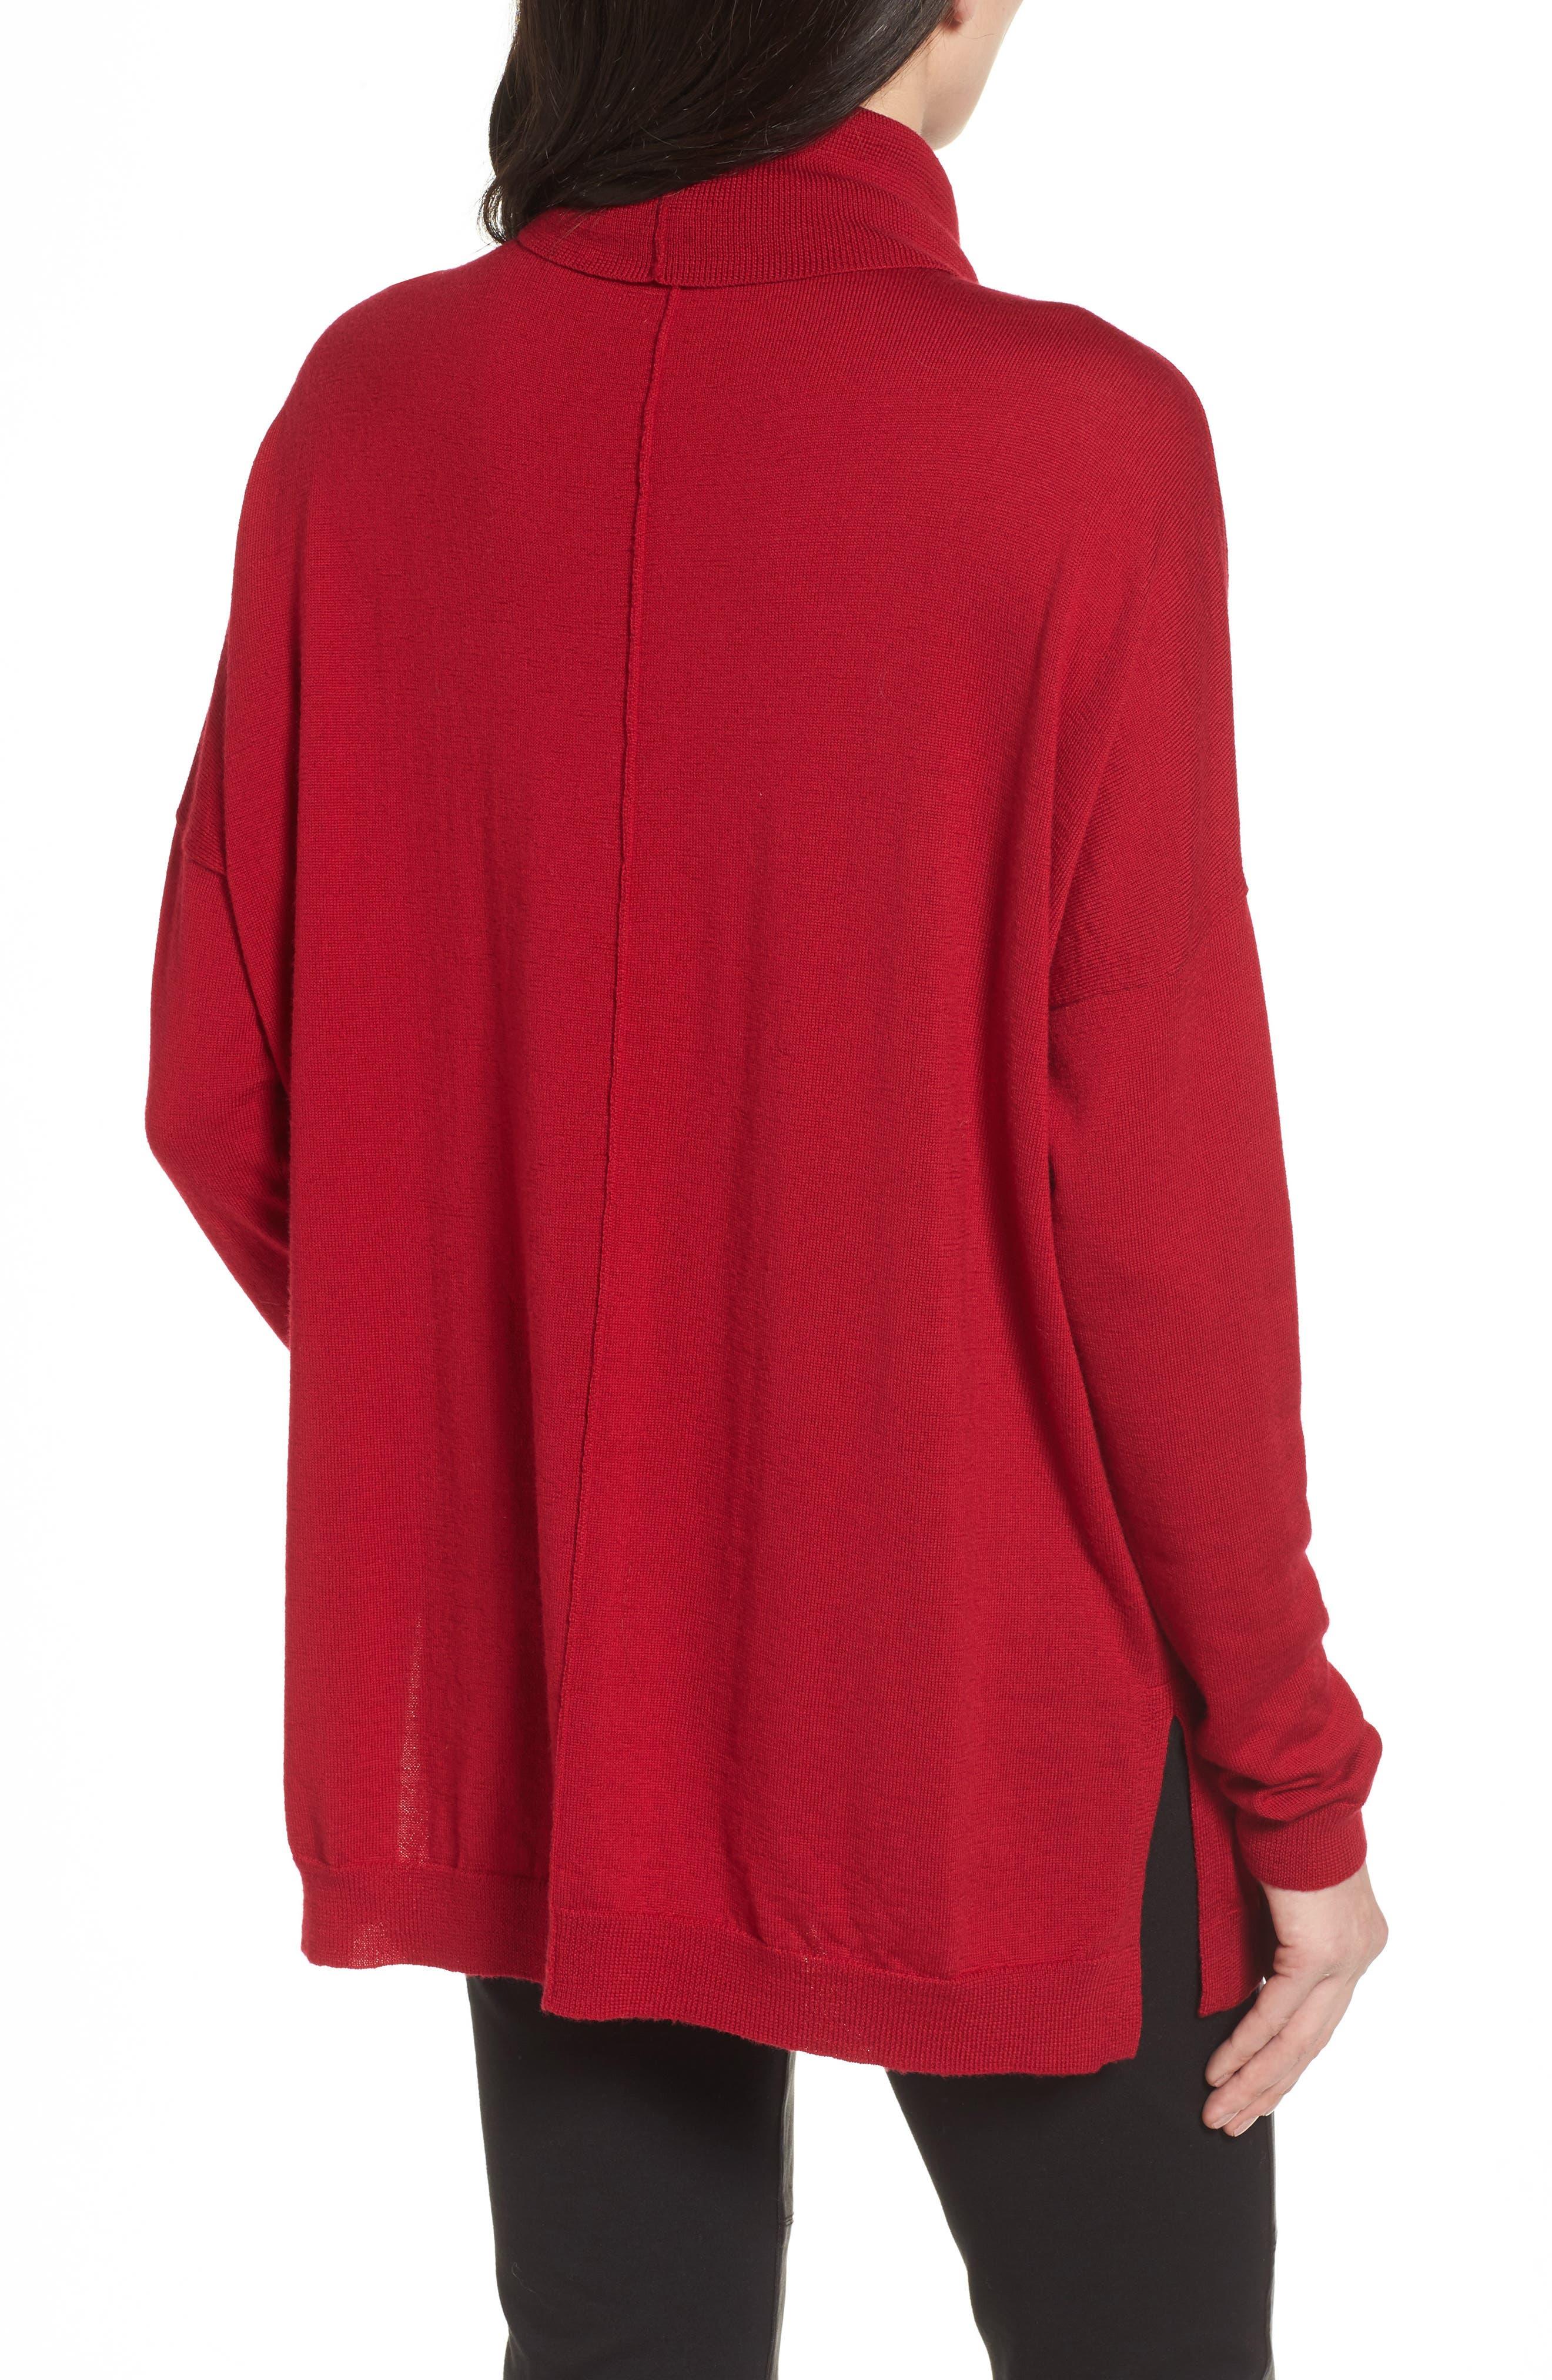 Alternate Image 2  - Eileen Fisher Merino Wool Boxy Turtleneck Sweater (Regular & Petite)